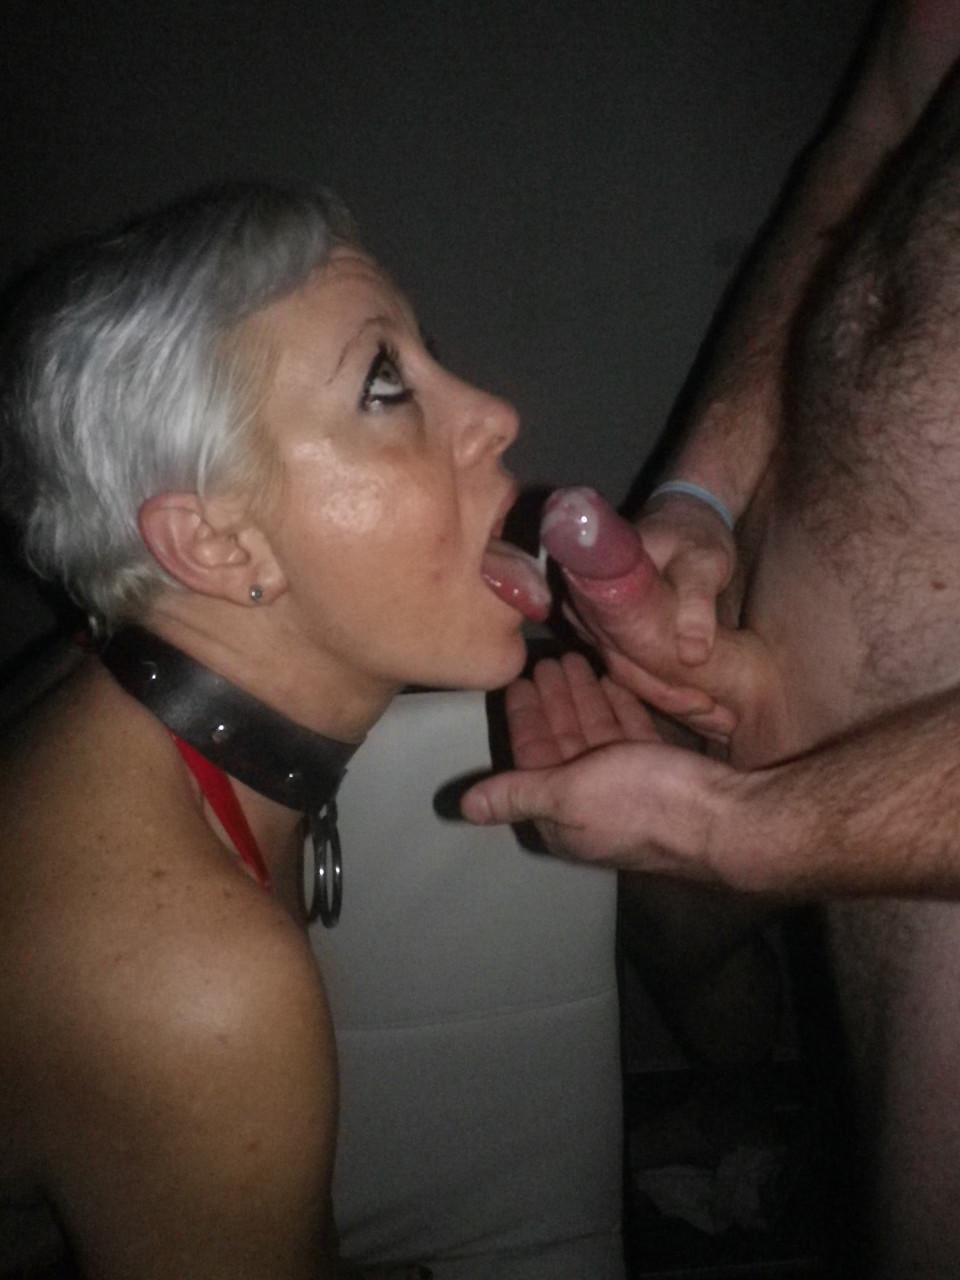 Erotic massage in kensington london